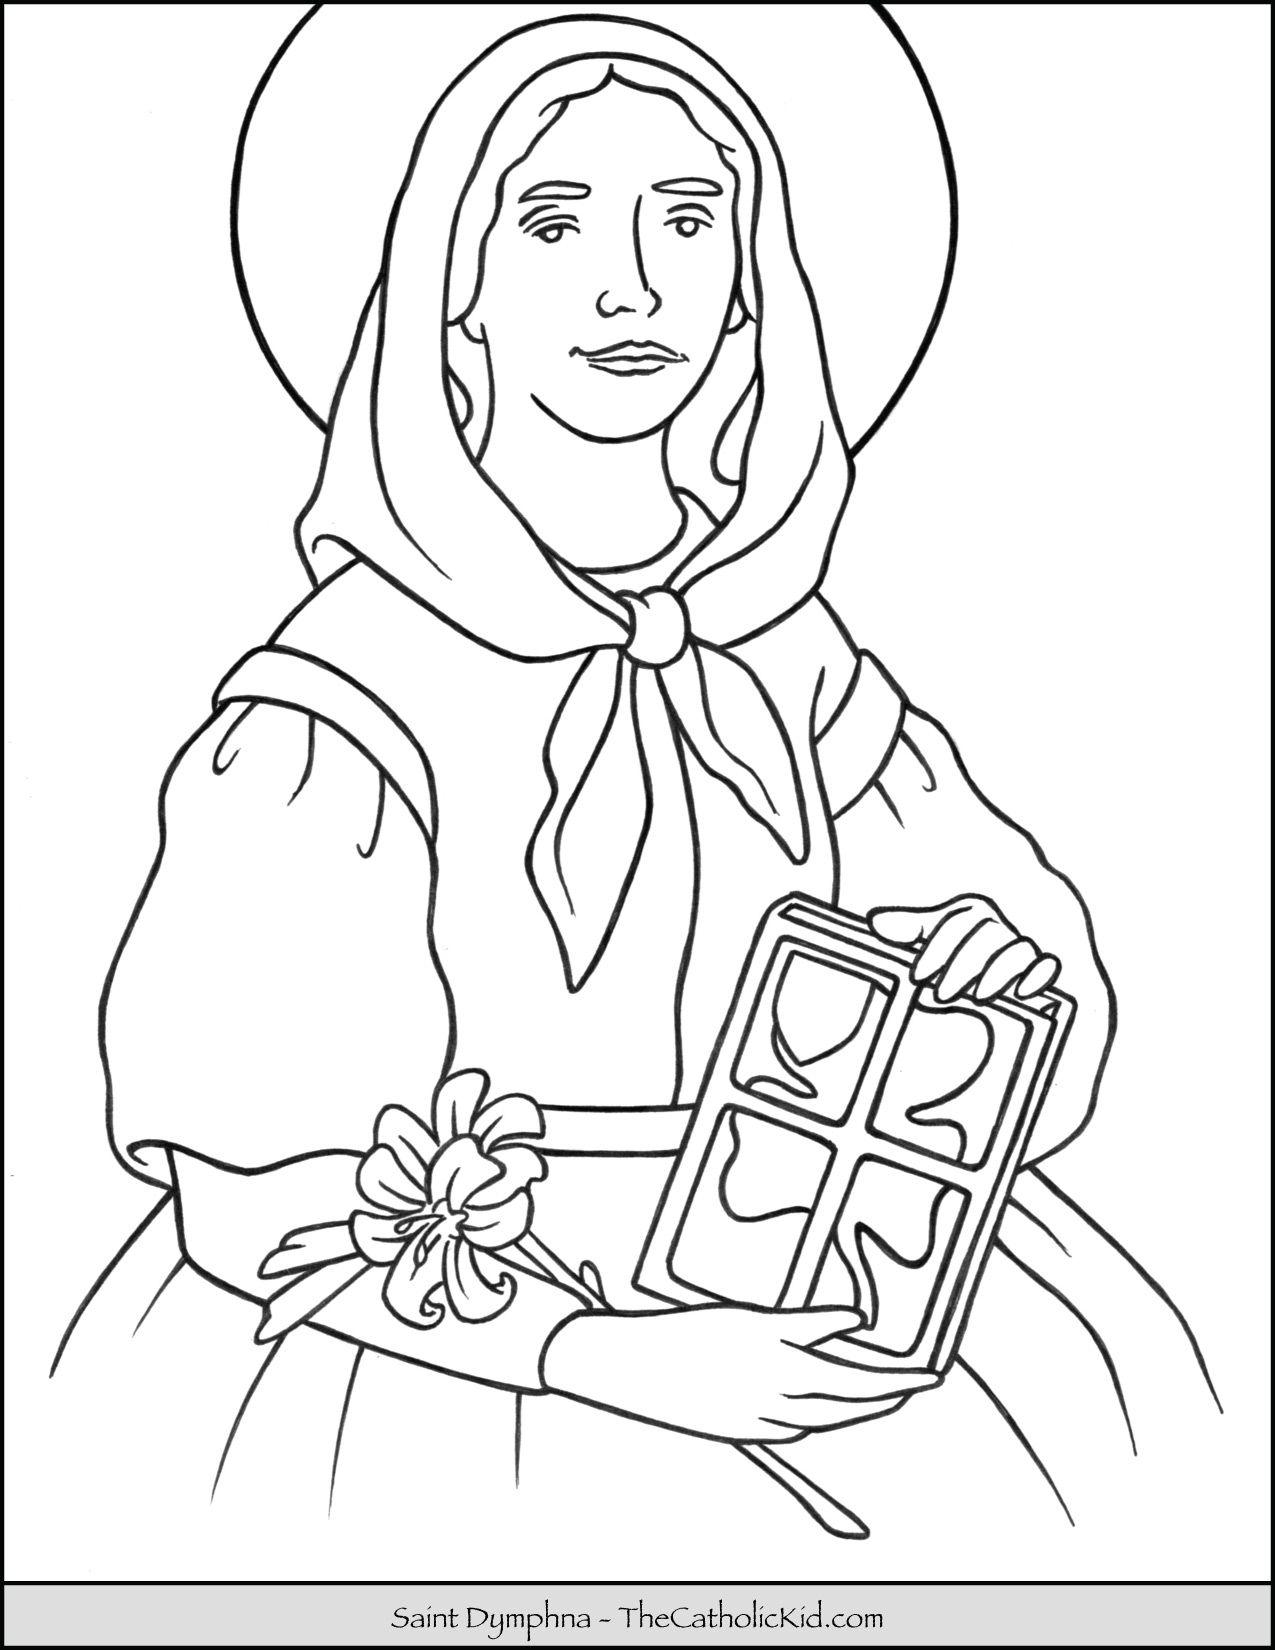 Saint Dymphna Coloring Page Thecatholickid Com Saint Coloring